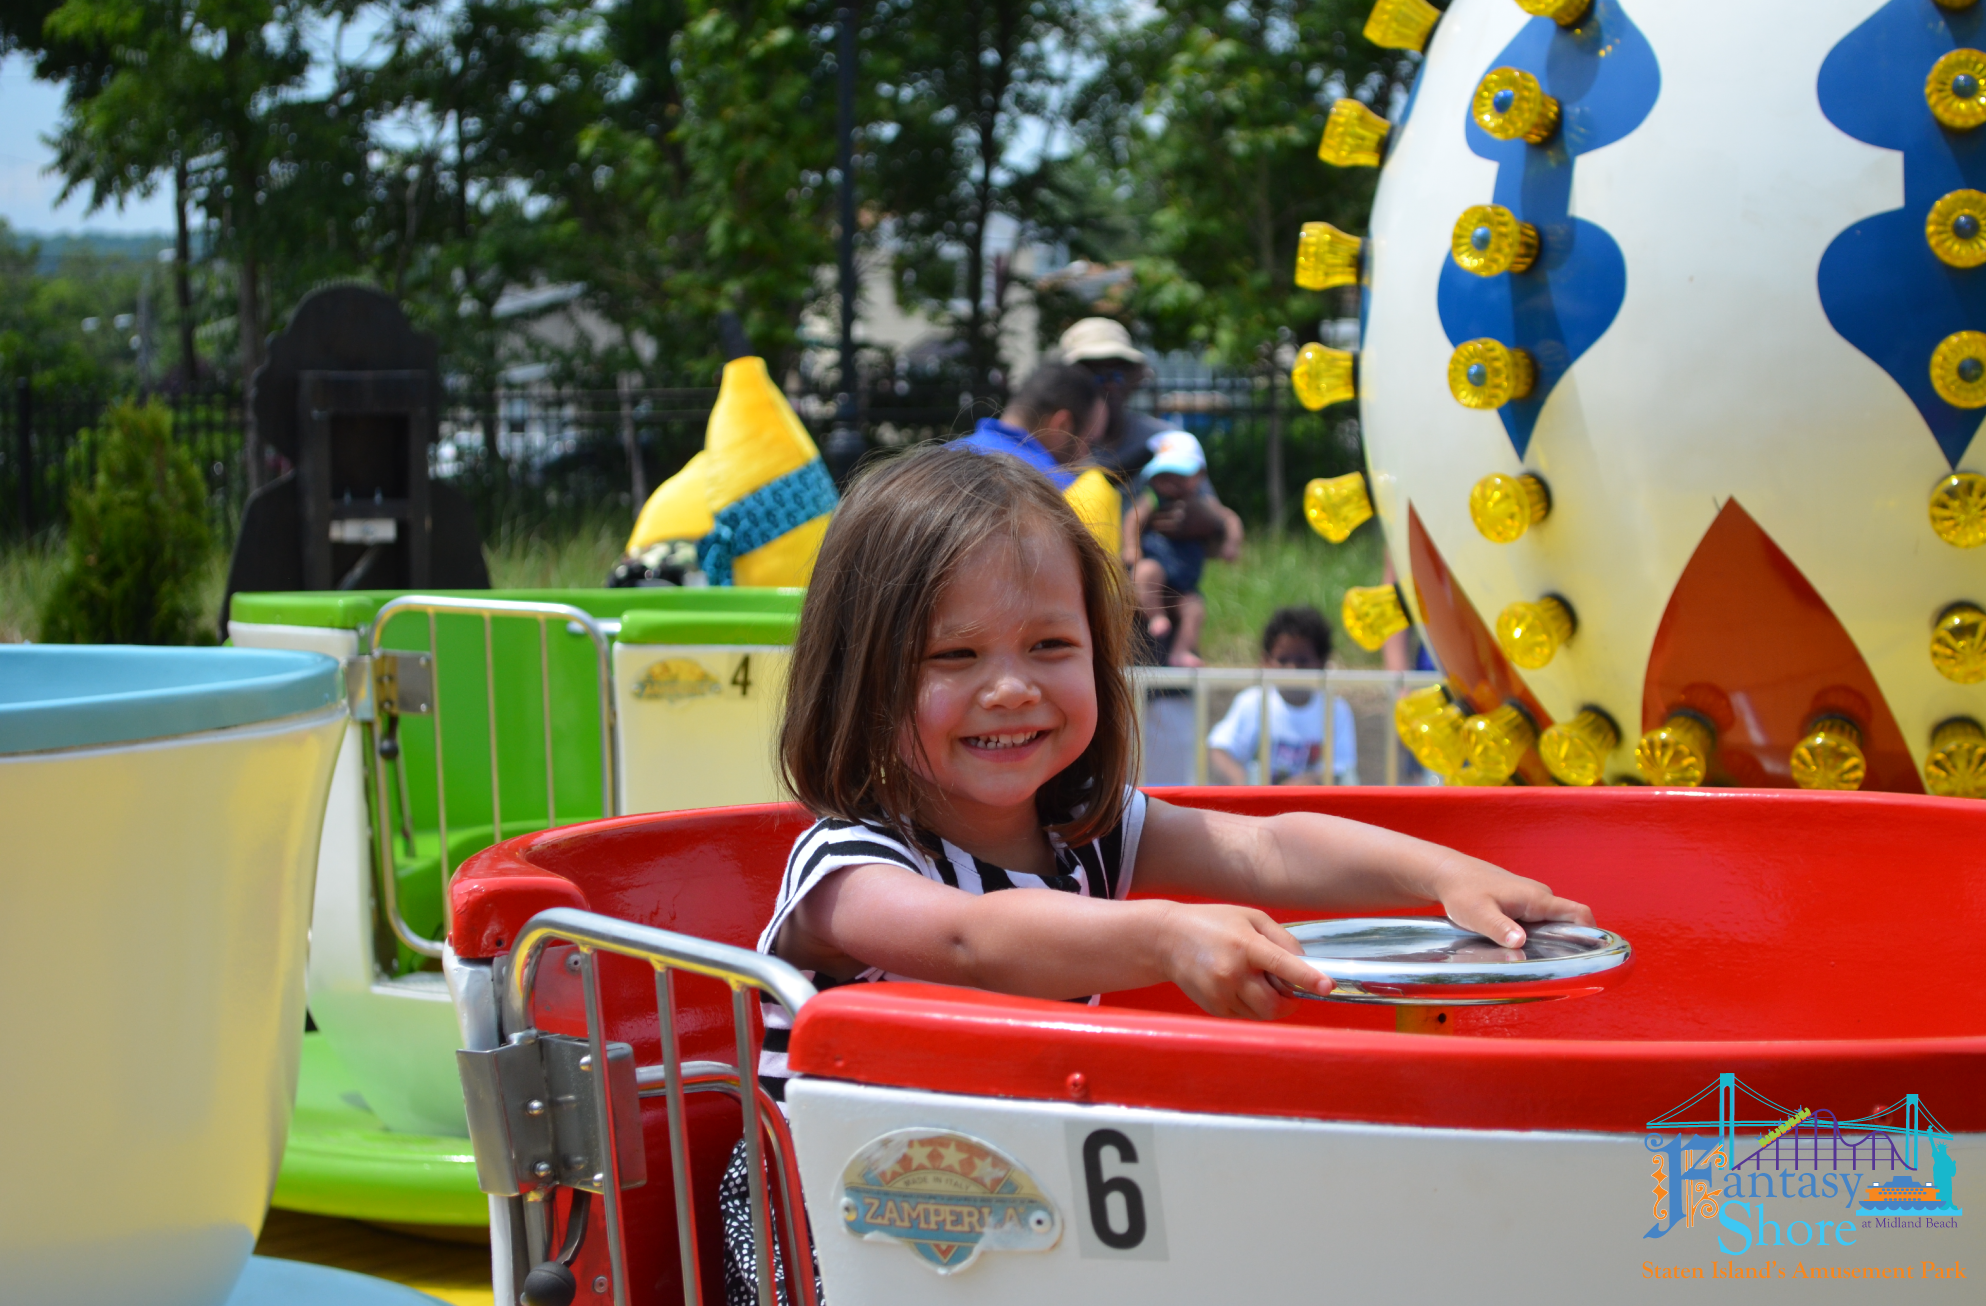 Teaside Seacups Ride Entertainments